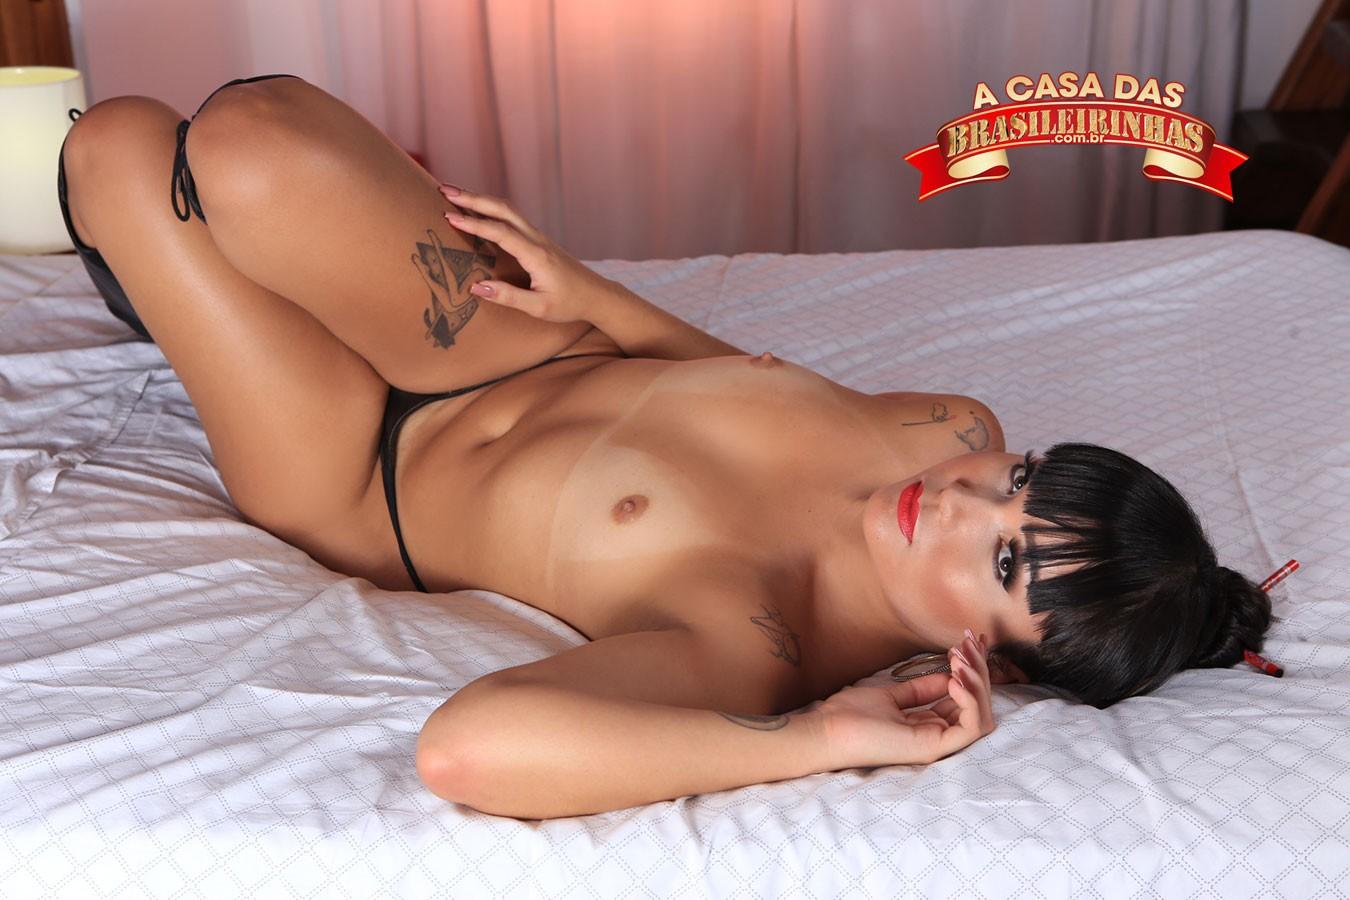 Lina-Nakamura-deitada-peladinha.jpg